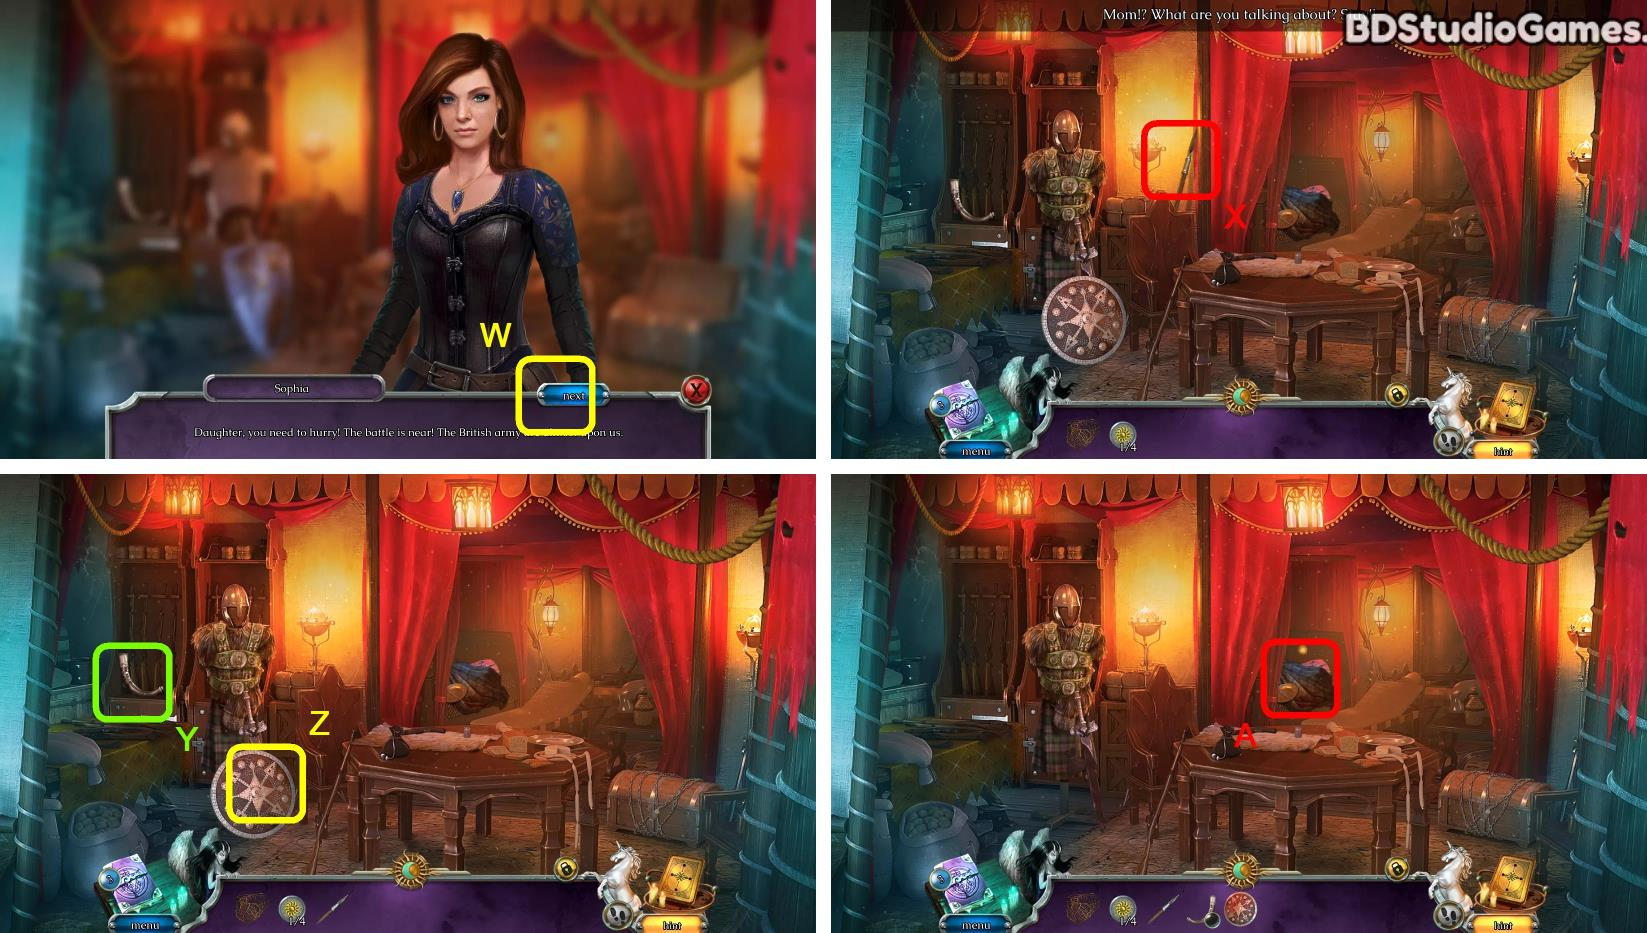 The Seven Chambers Walkthrough Screenshot 0010